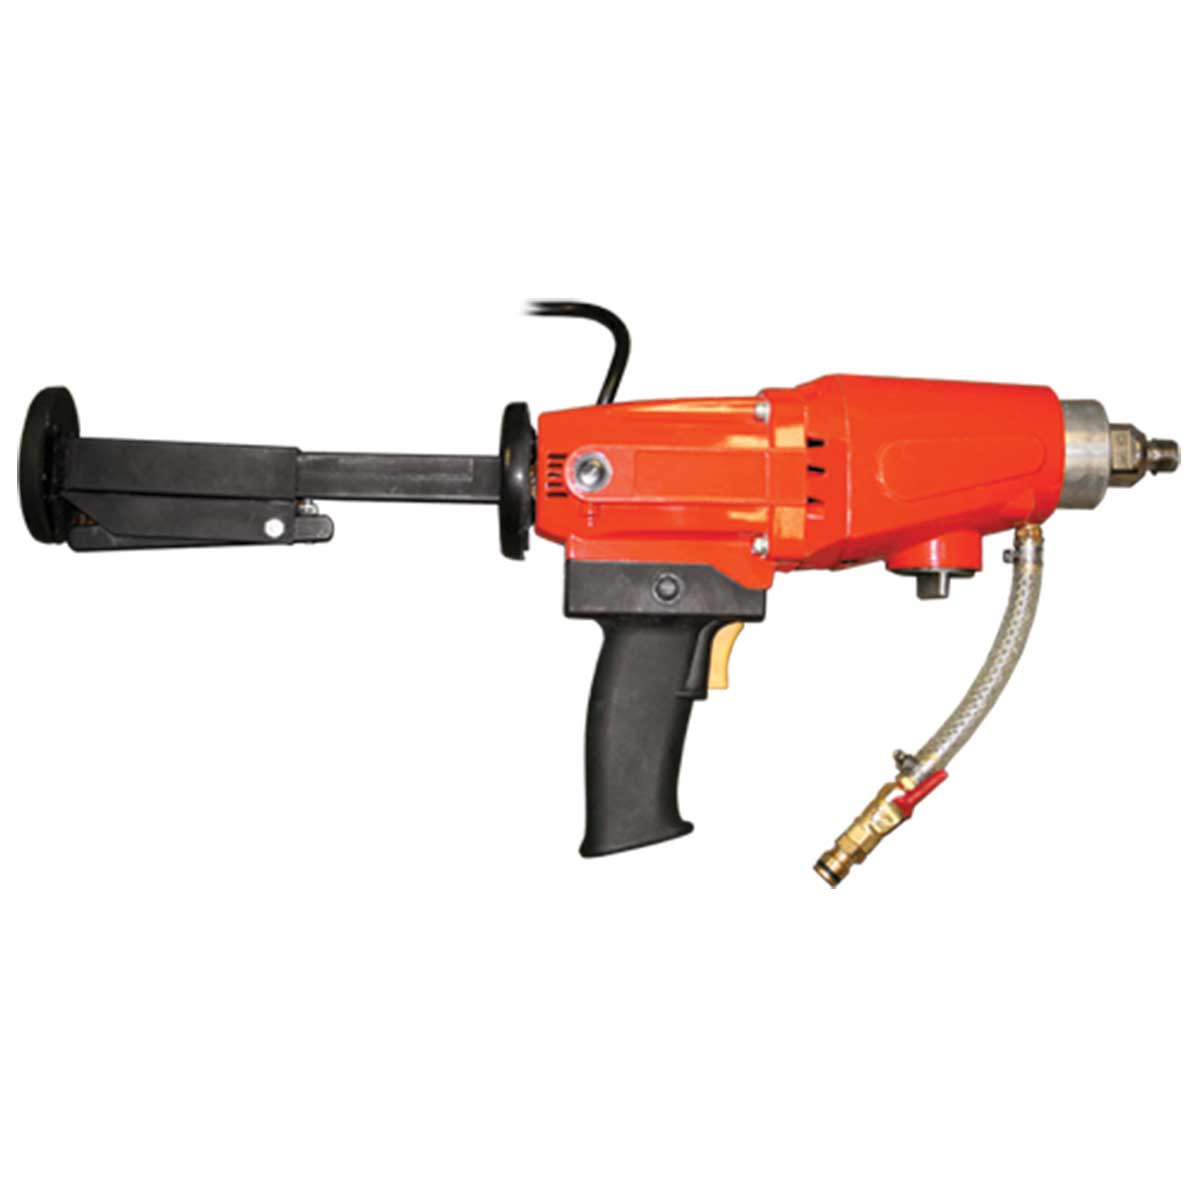 Core Bore Wet Core Drill, 2 Speed